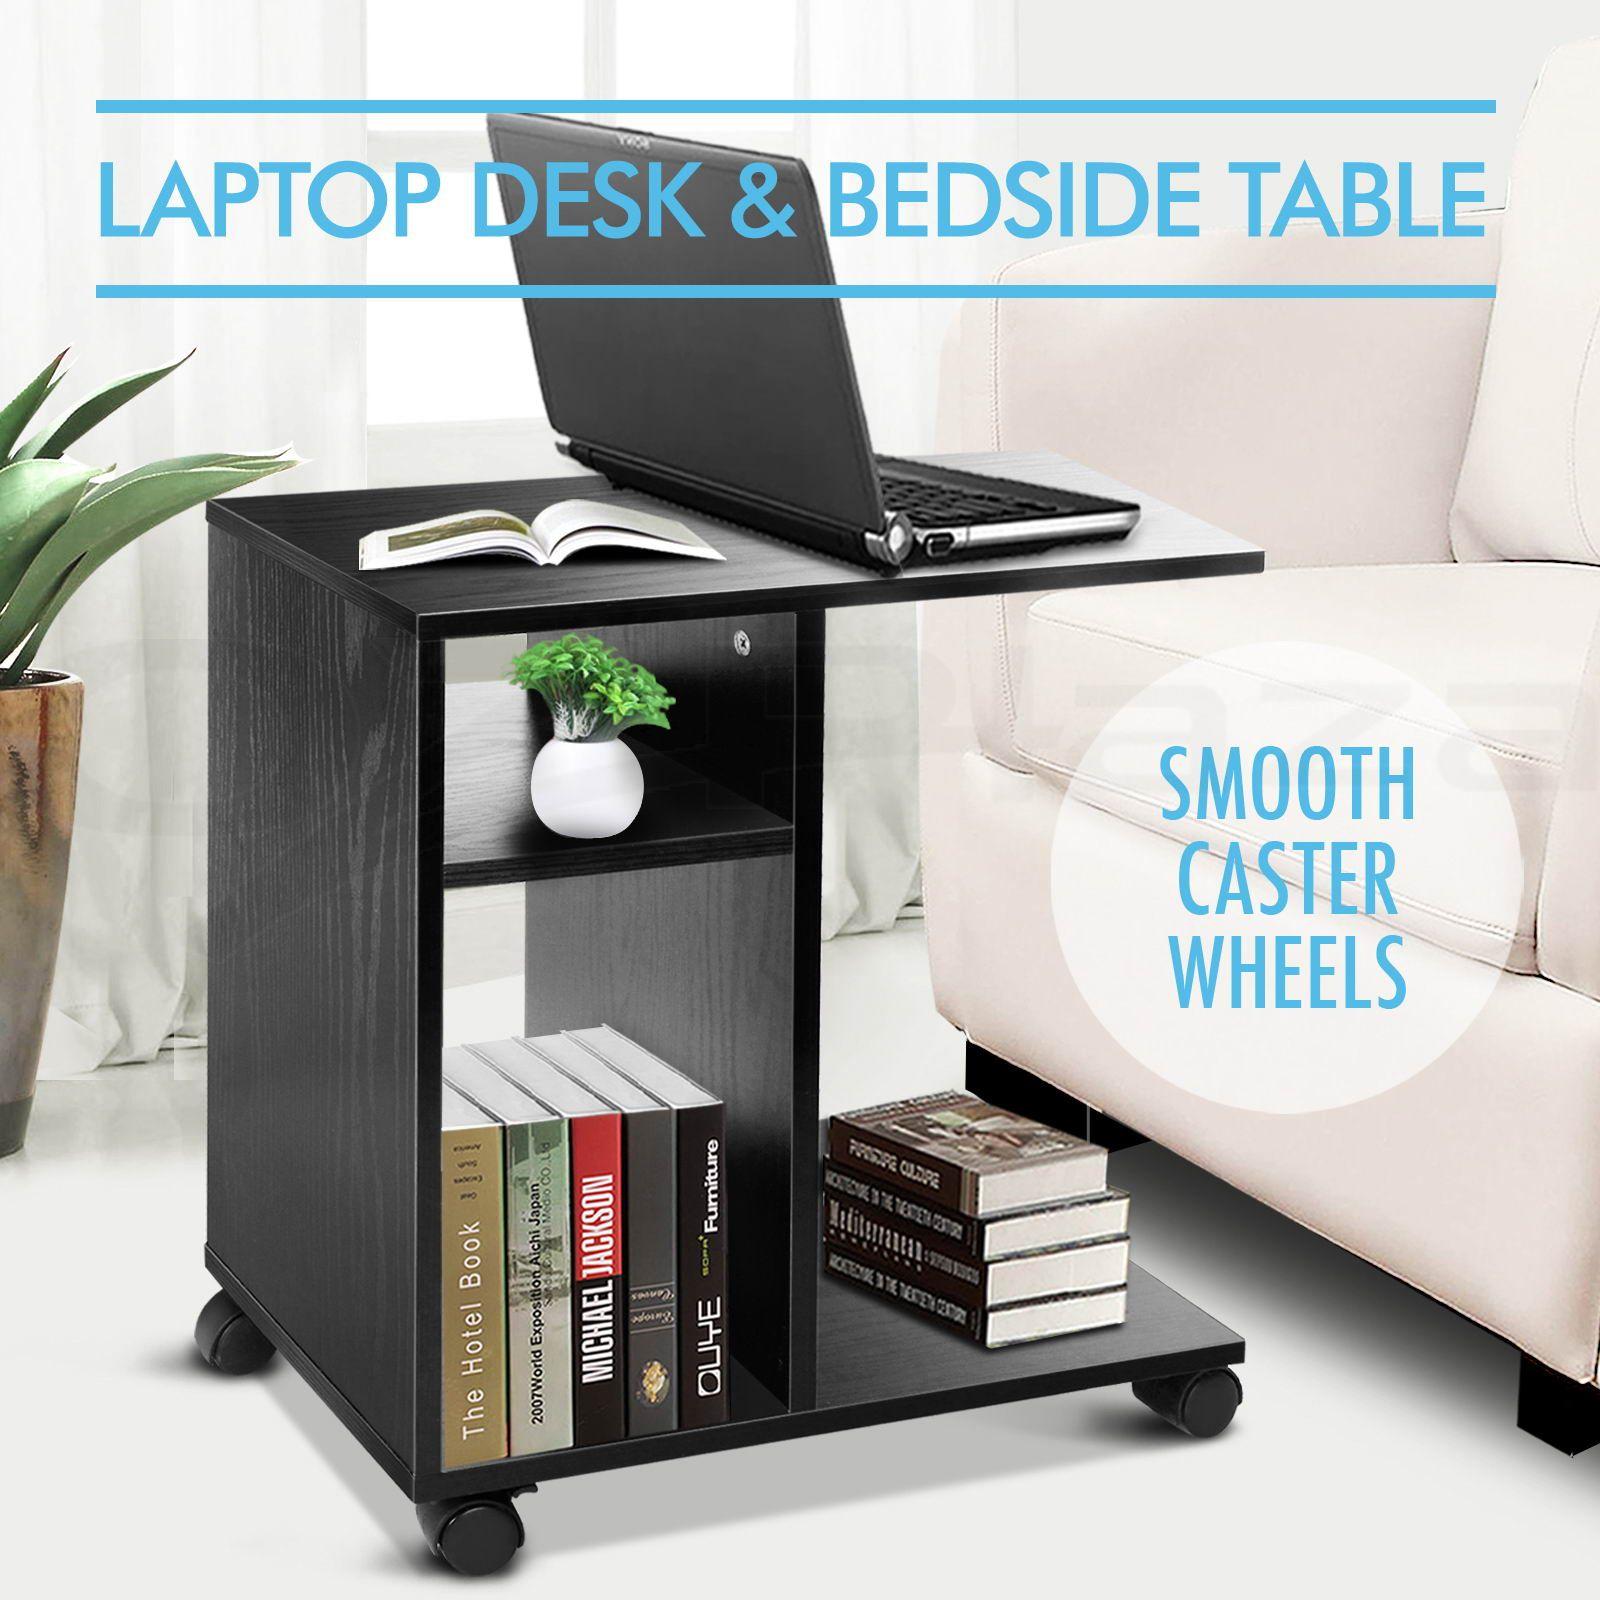 Mobile Computer Laptop Desk Entertainment TV Stand Or Bedside Table   Black